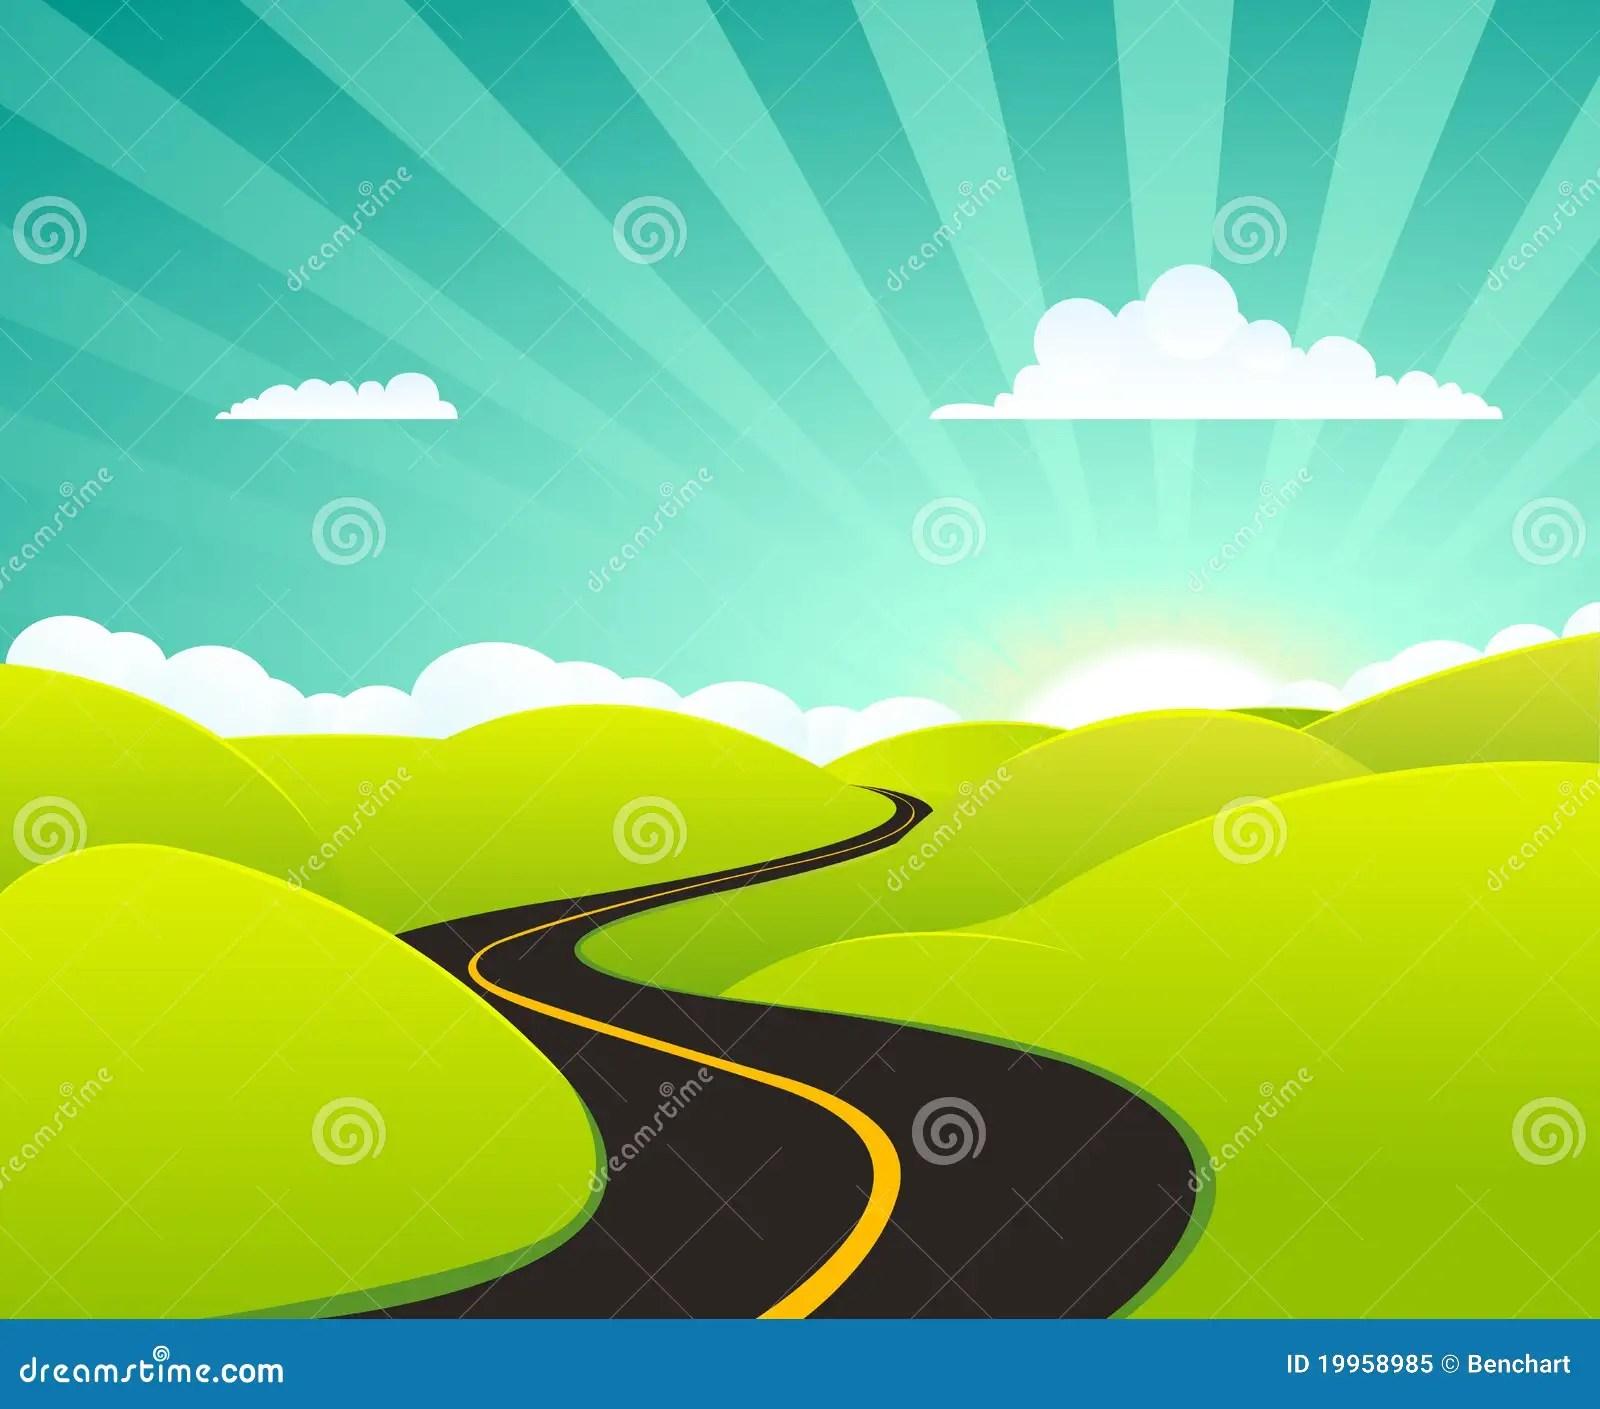 Car Wallpaper Themes Cartoon Summer Highway Royalty Free Stock Photo Image